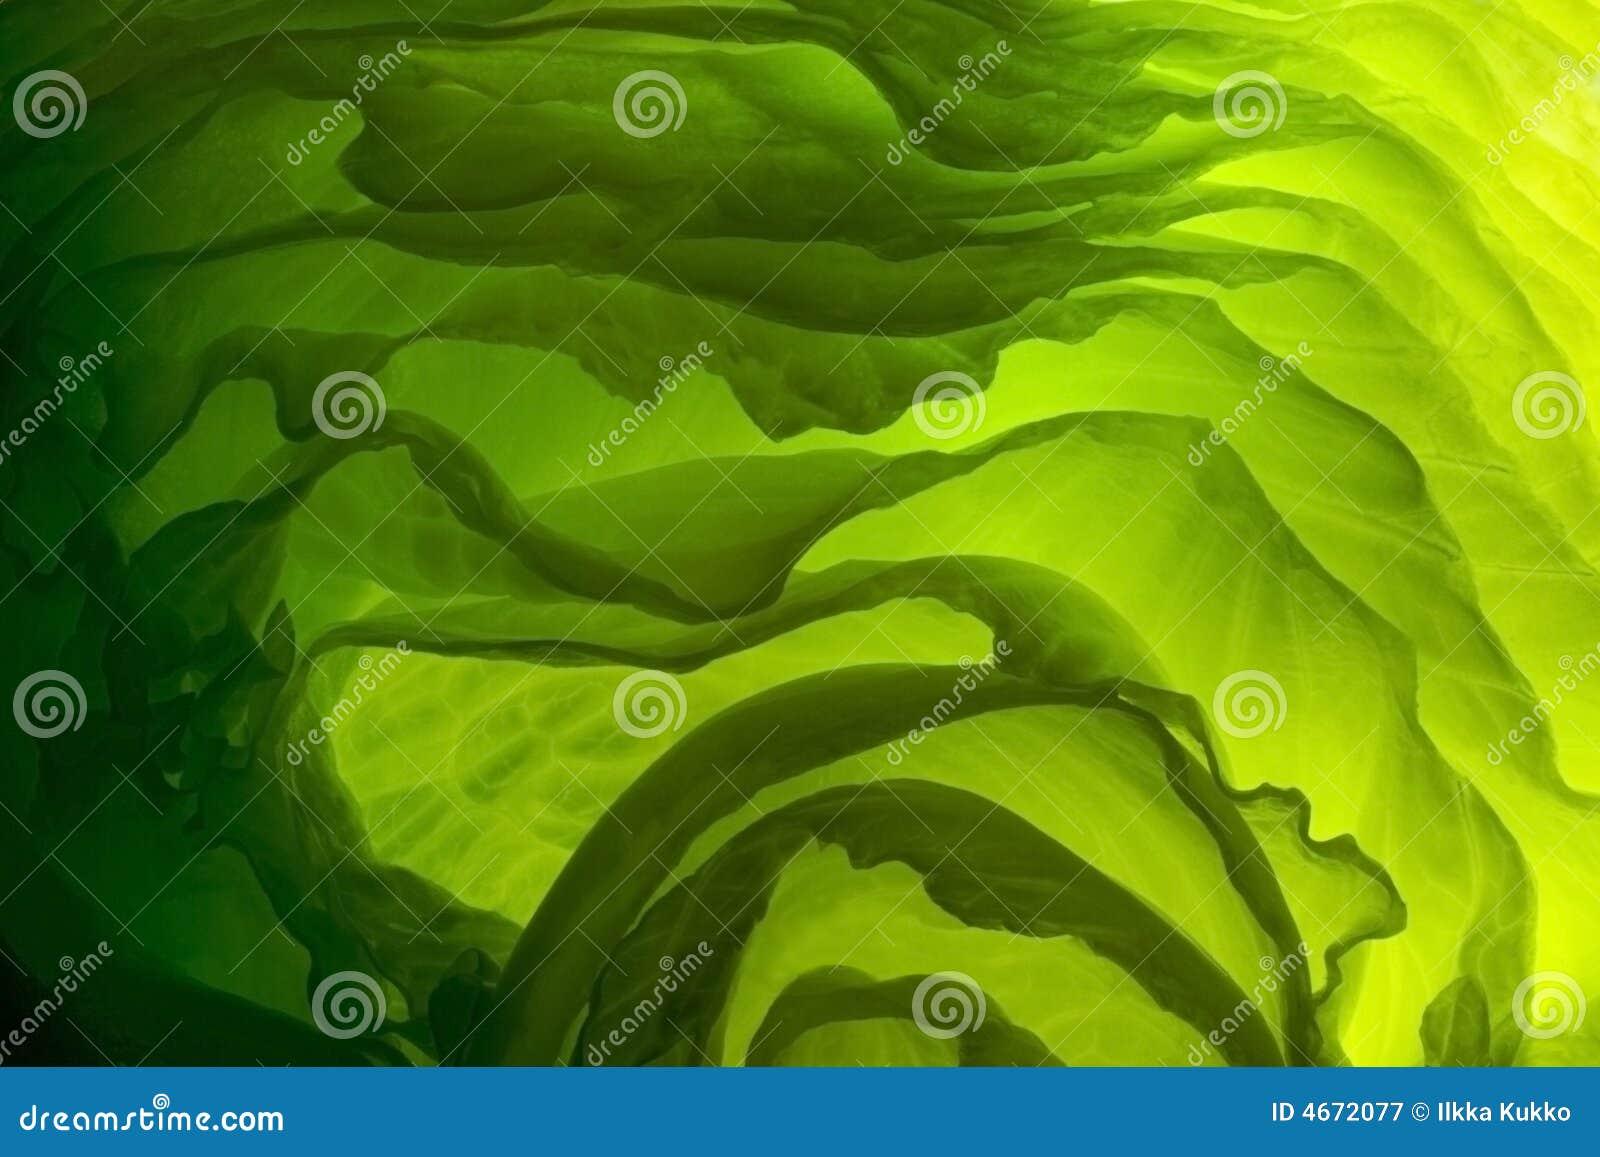 Zieloną sałatkę